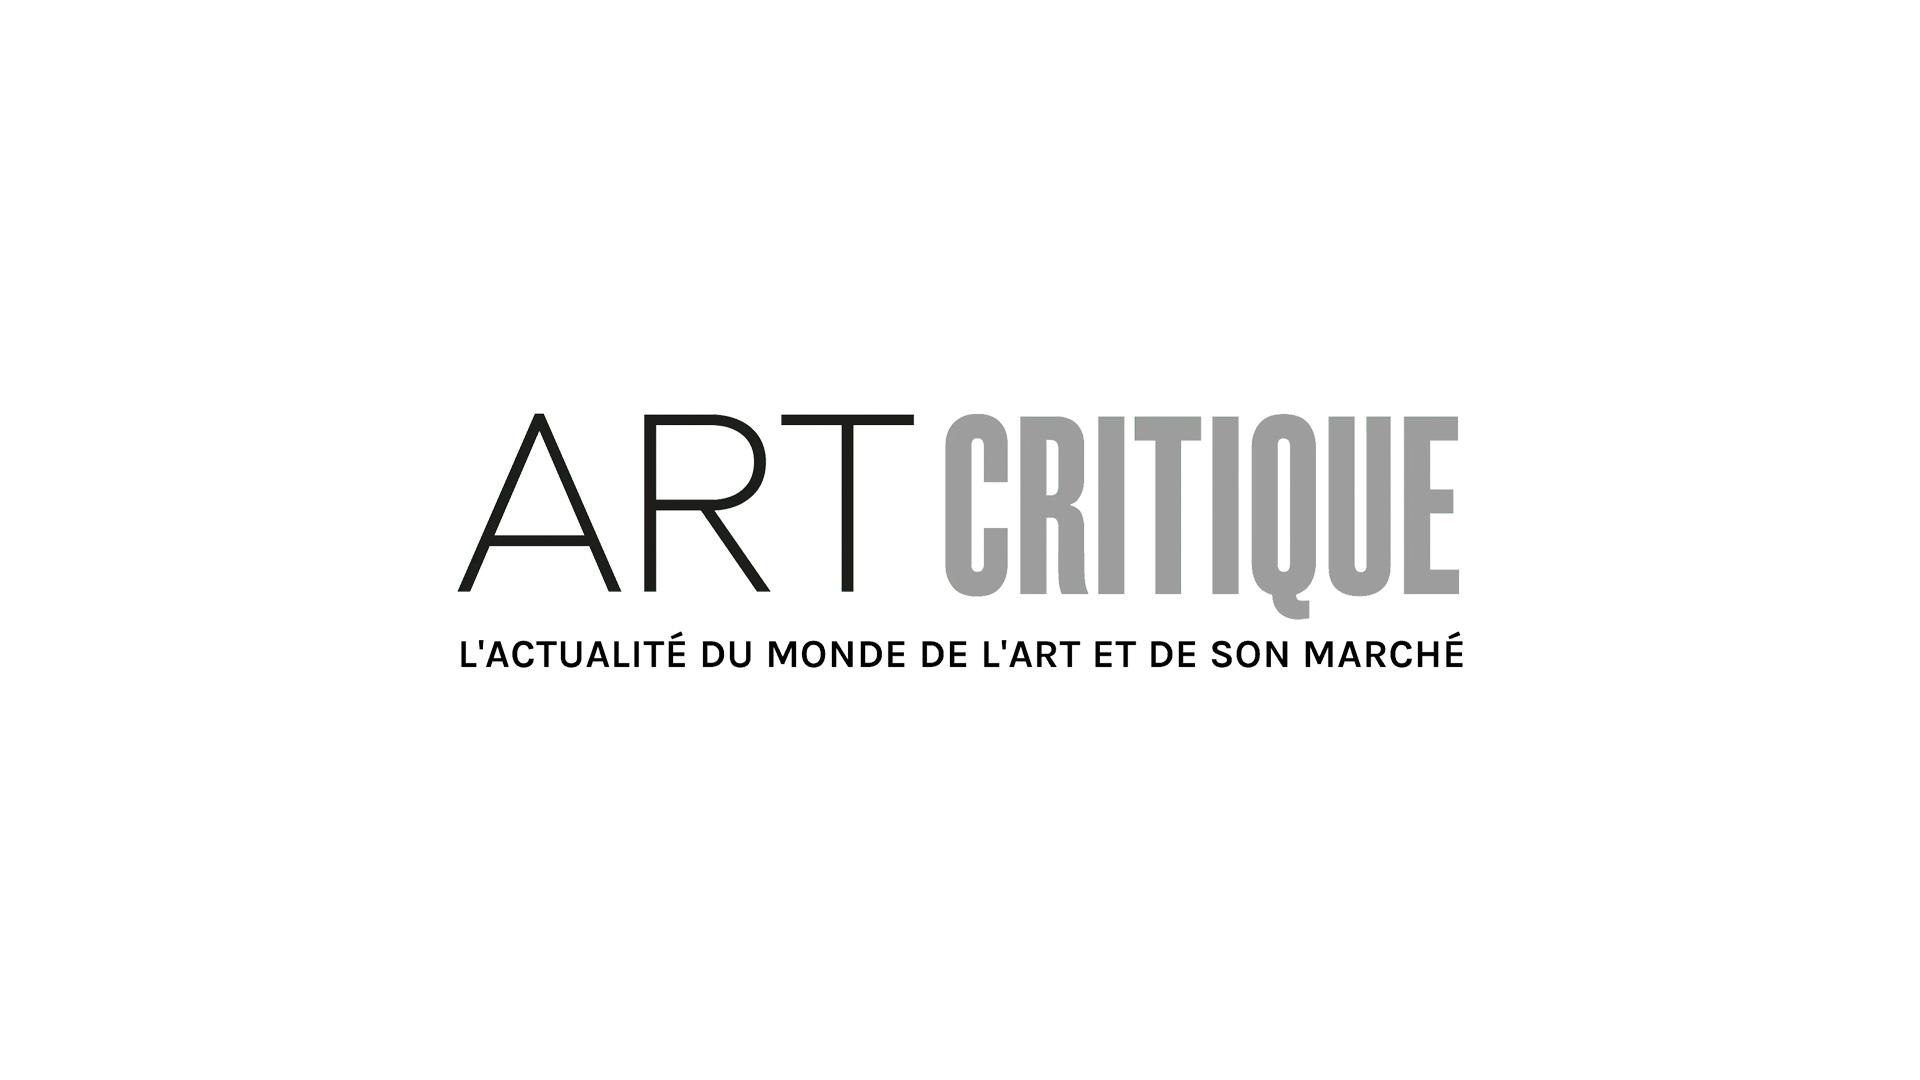 Man steals $20,000 Salvador Dalí from San Fran gallery